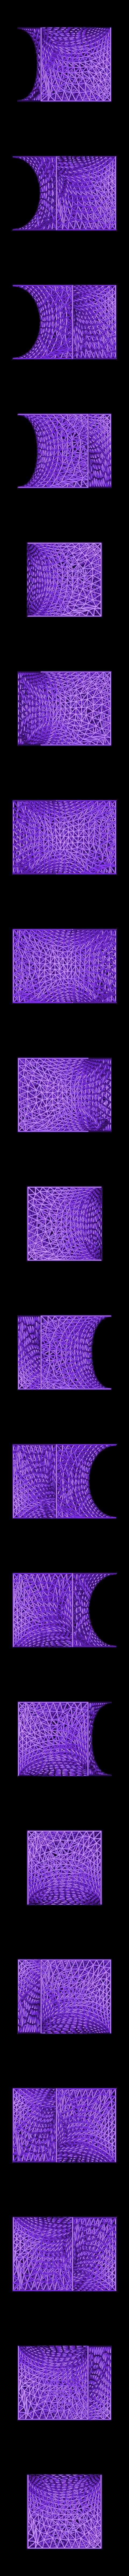 cube_Plateau_problem.stl Download free STL file Cube Plateau Problem • Model to 3D print, zeycus